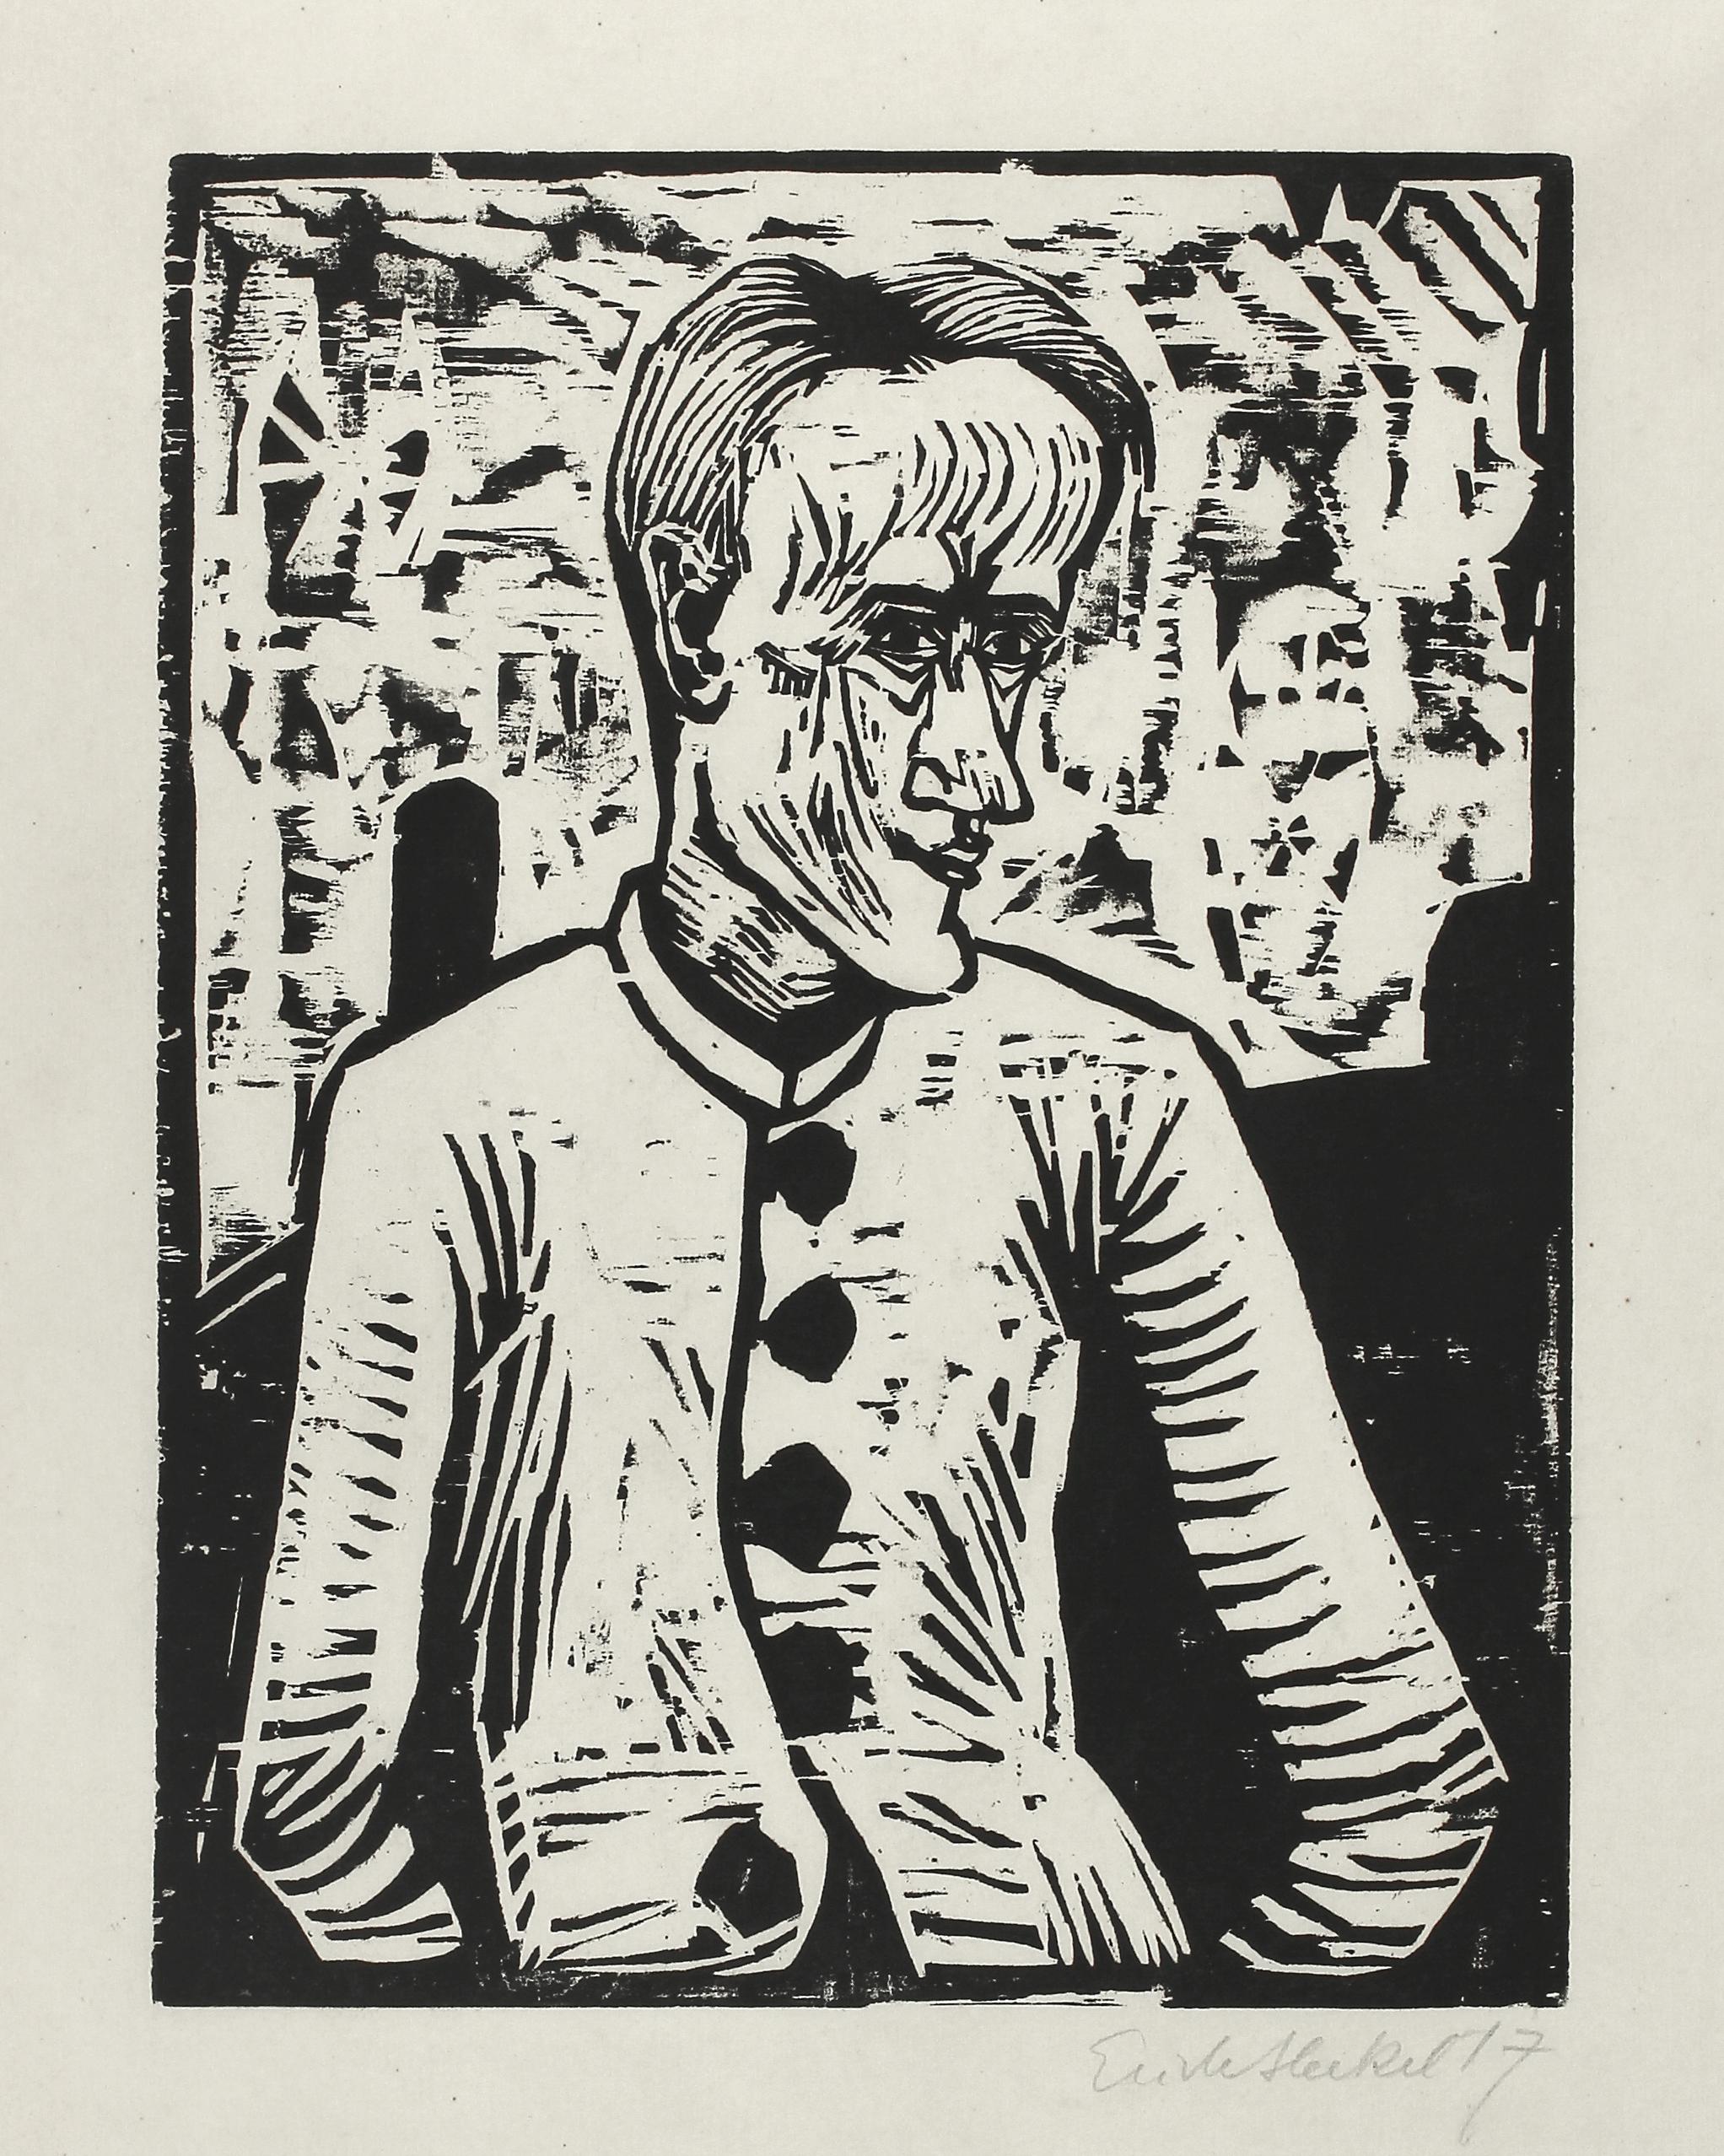 Der Narr (the Fool) by Erich Heckel